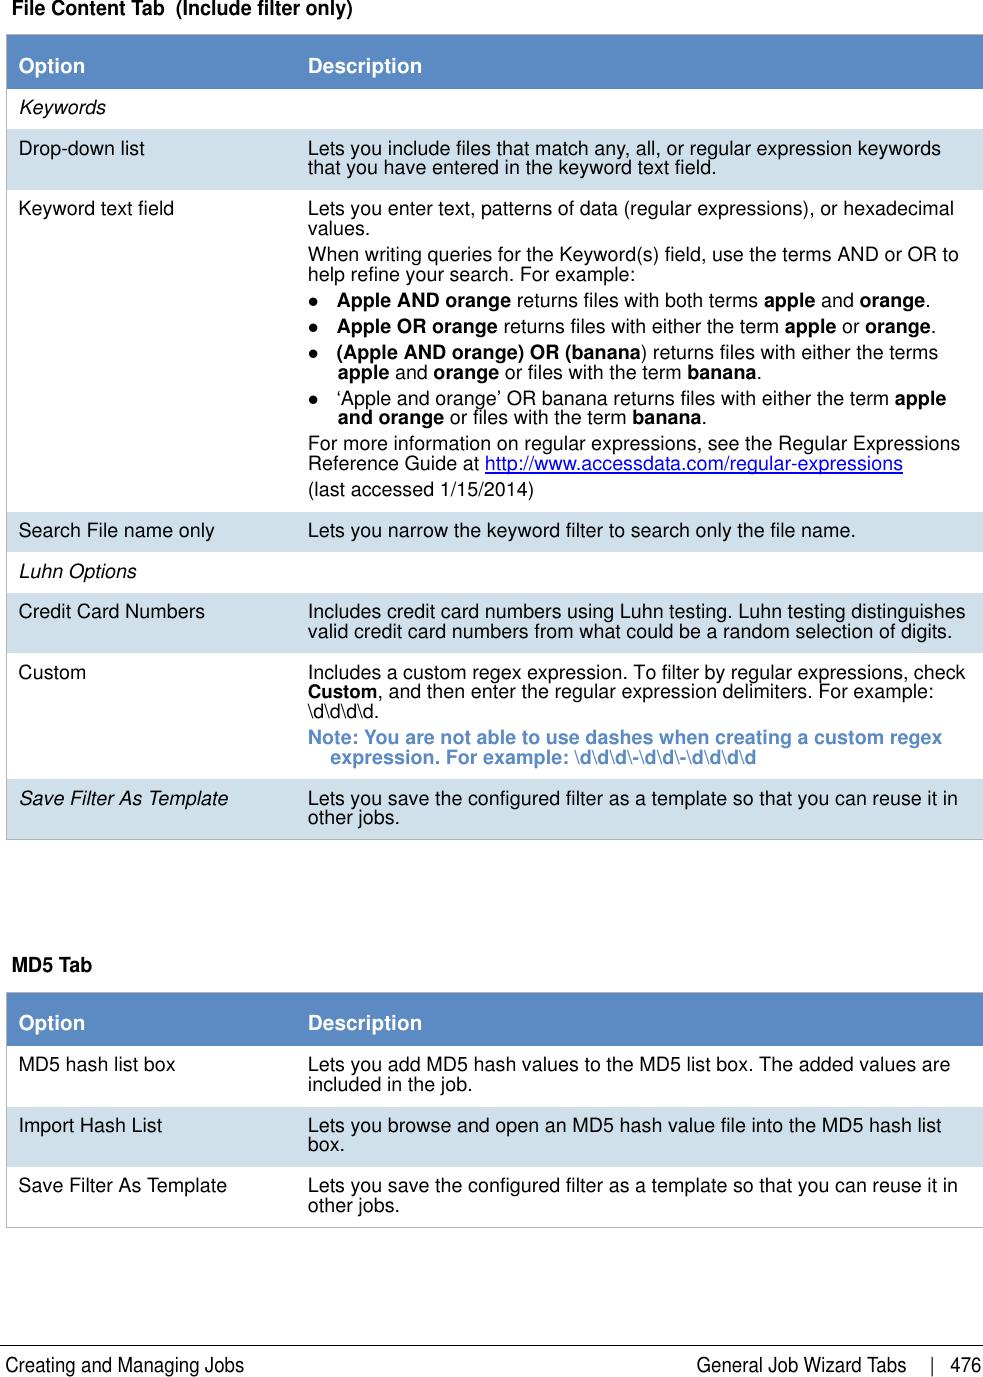 E Discovery Admin Guide